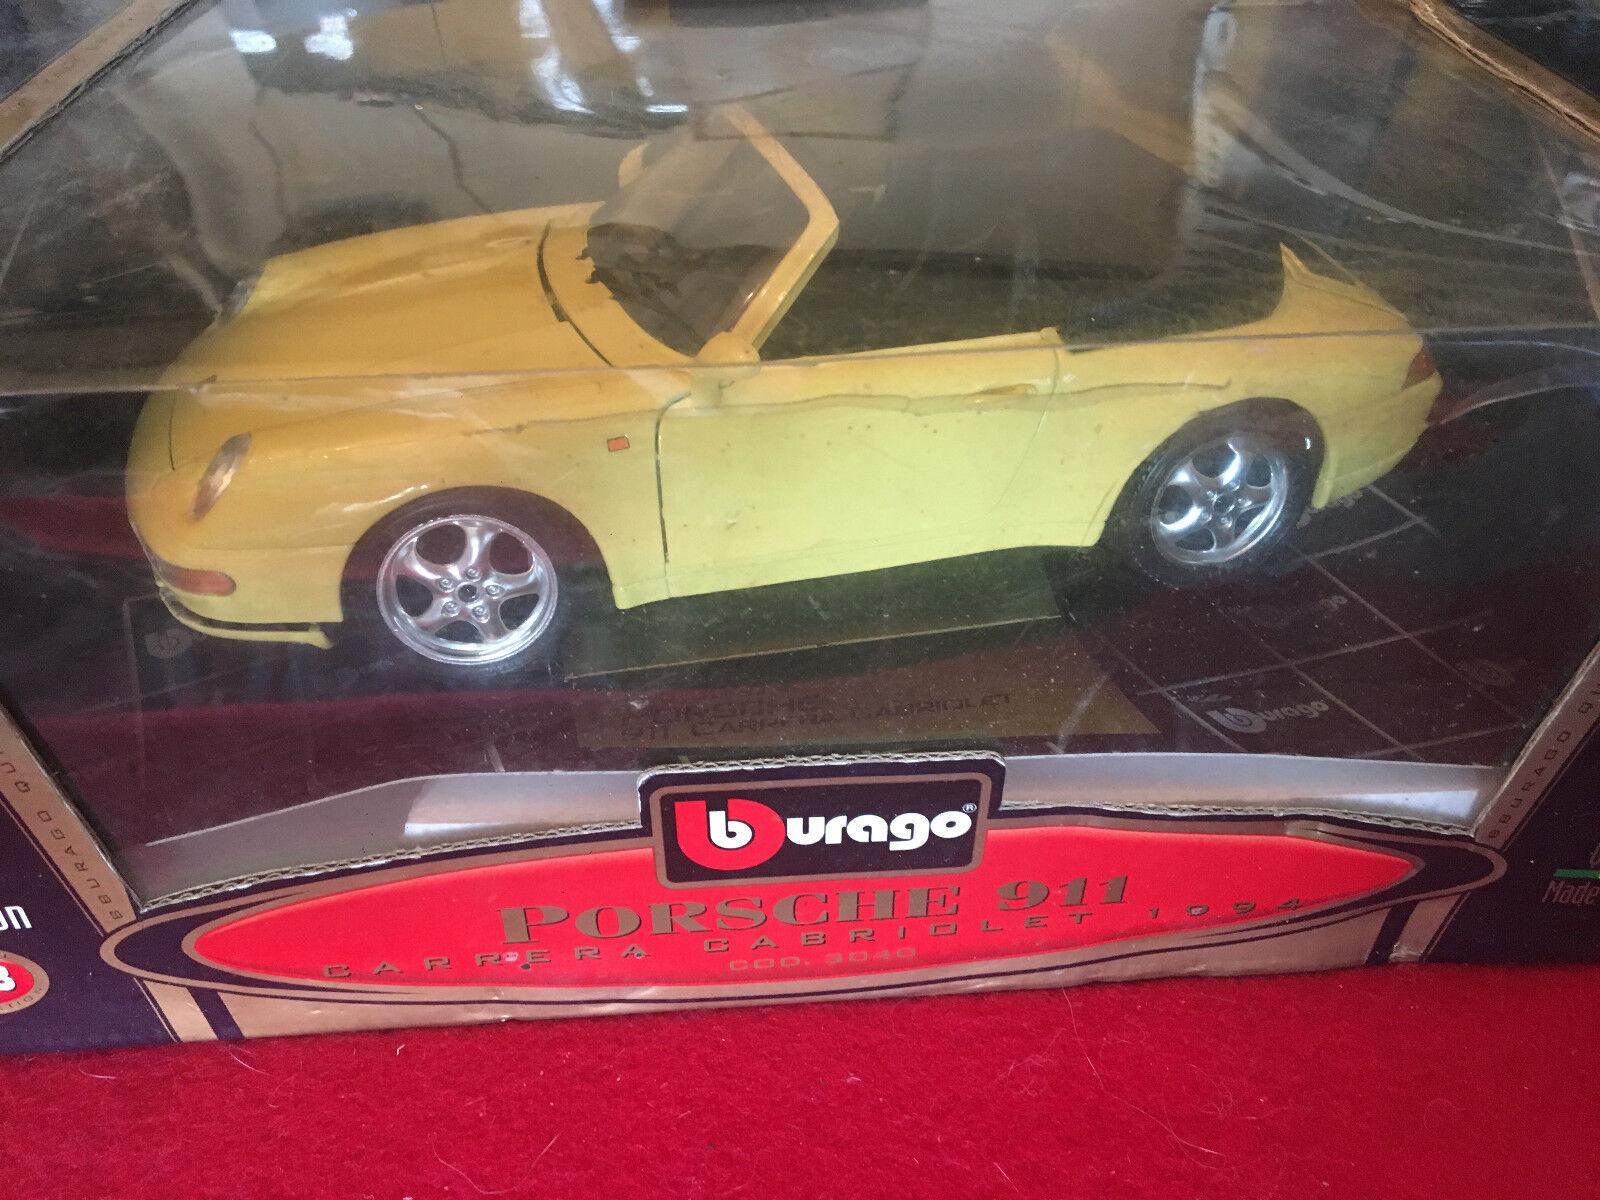 Cd188c Burago Carrera Cabriolet19941 Cavo Porsche 911 18 qSMpUzV